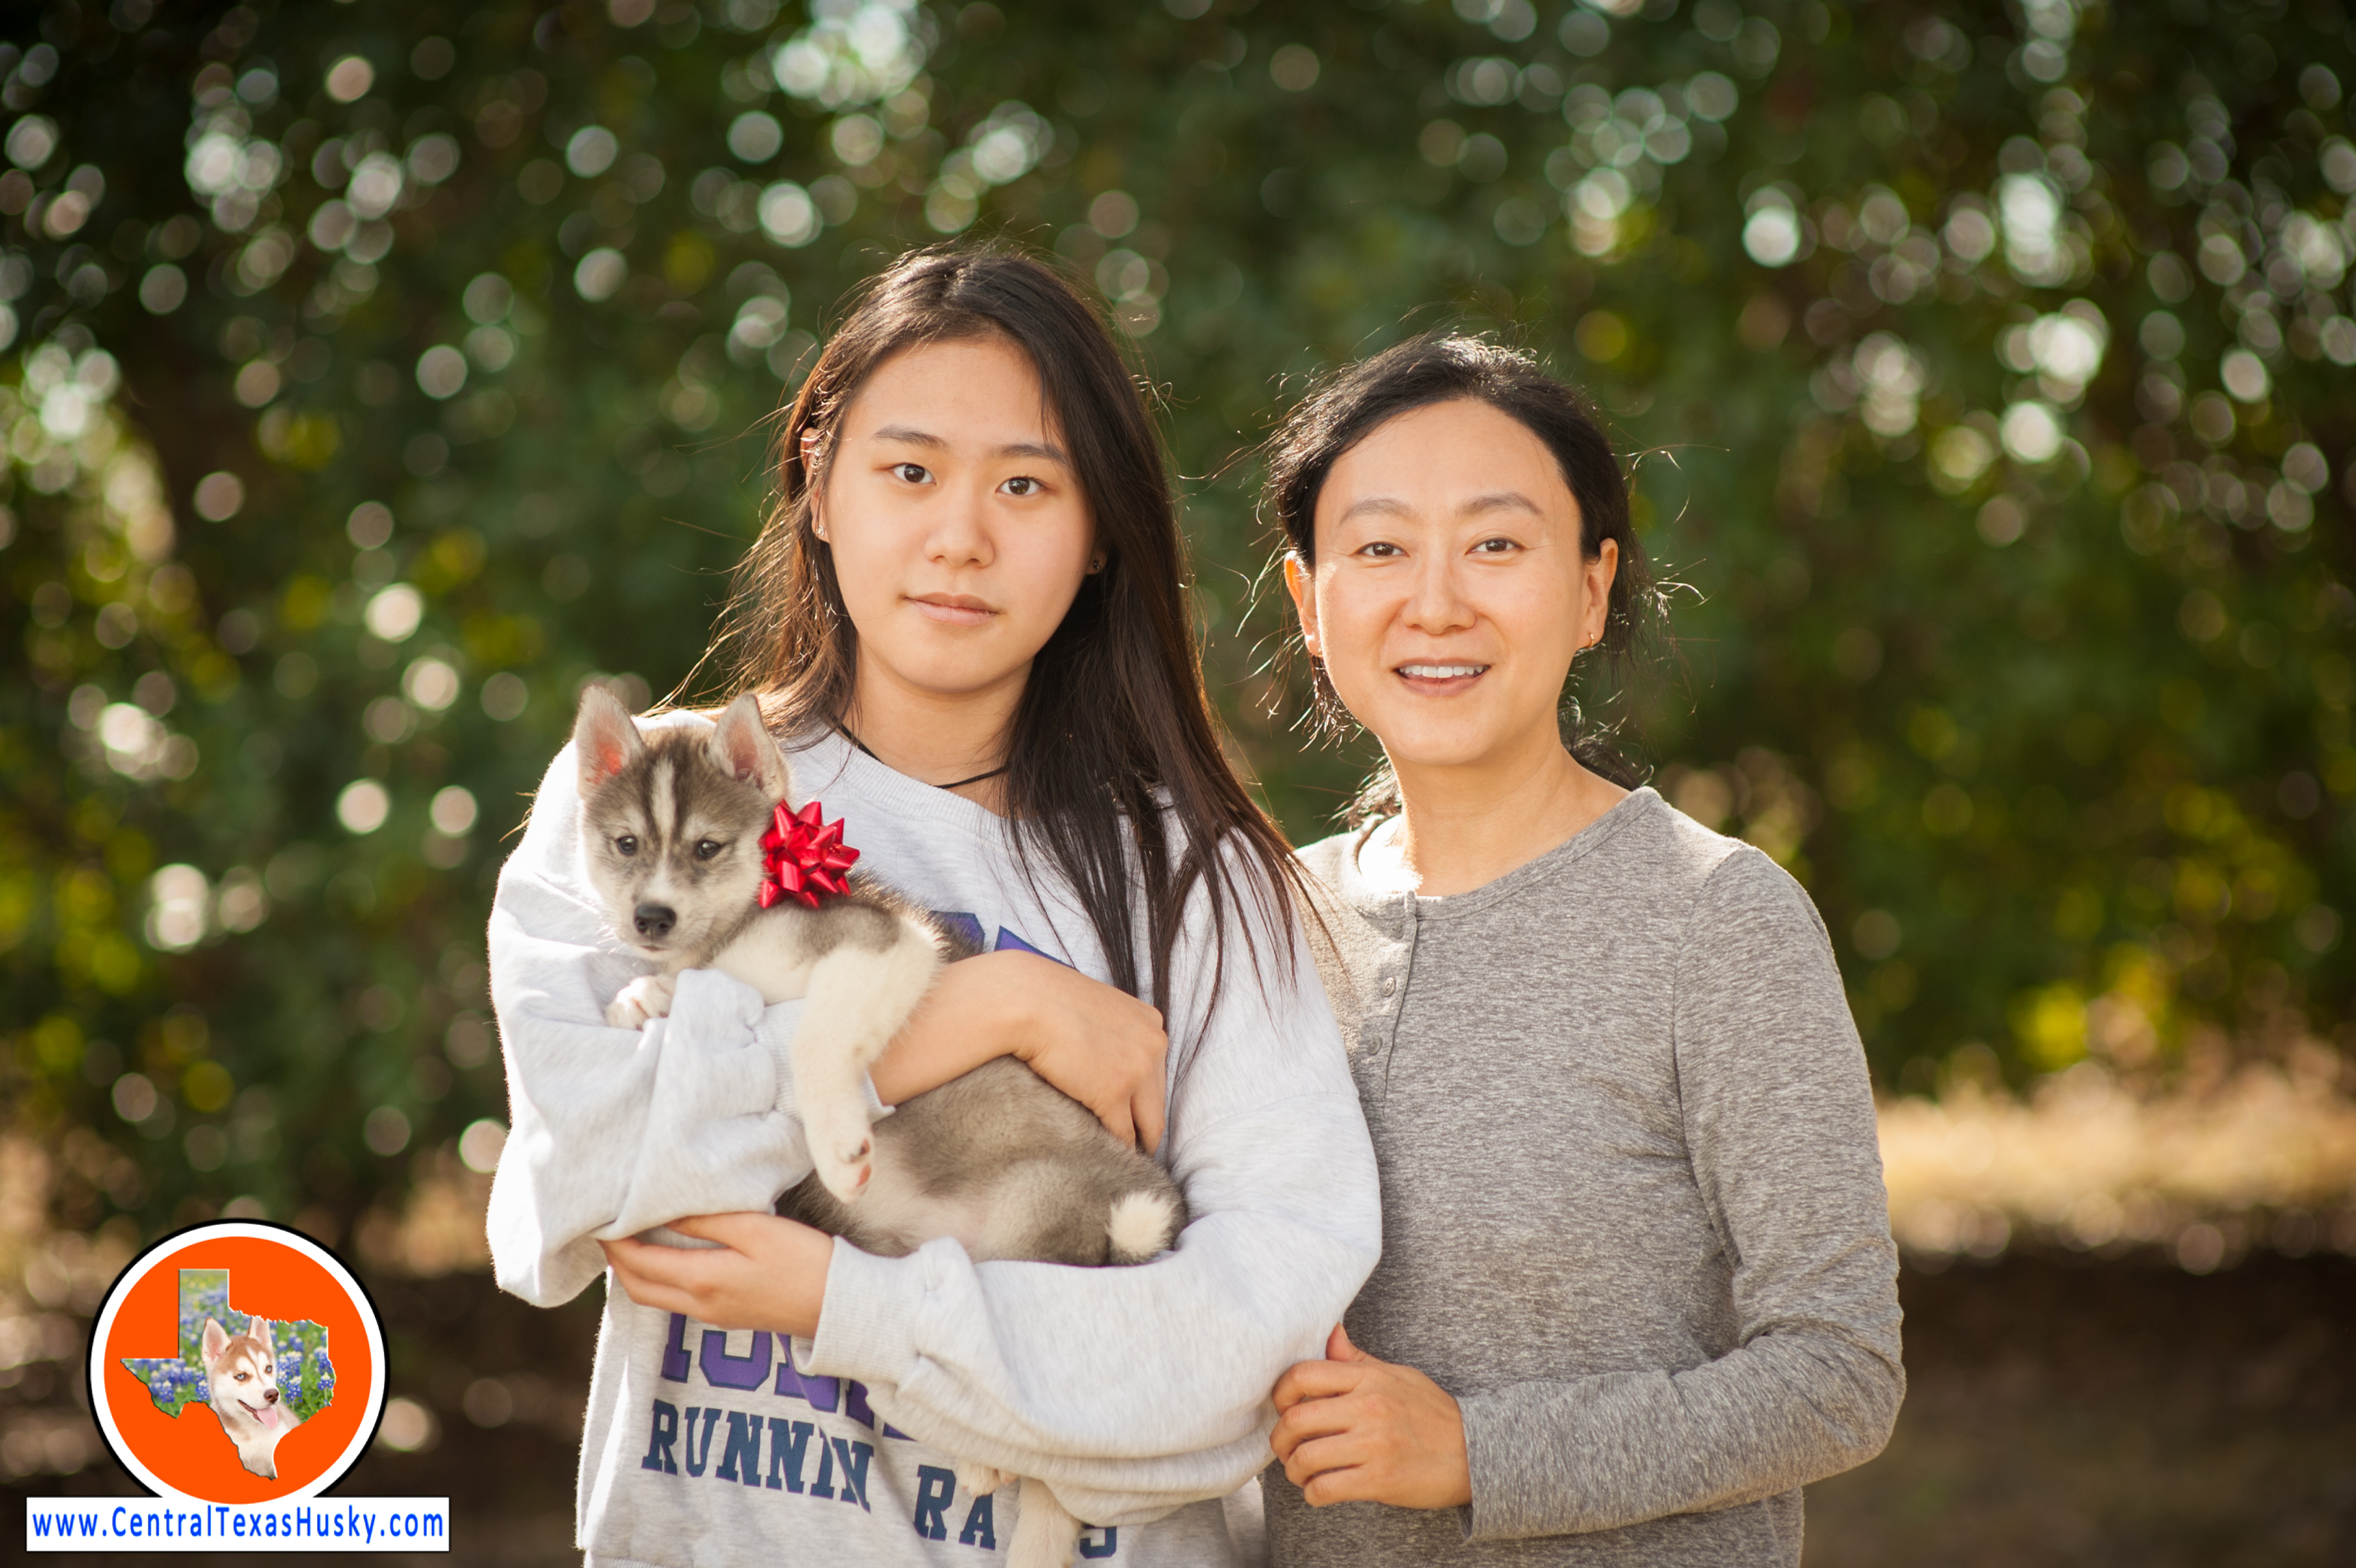 central-texas-husky_austin-siberian-husky-breeder_703139_20171202